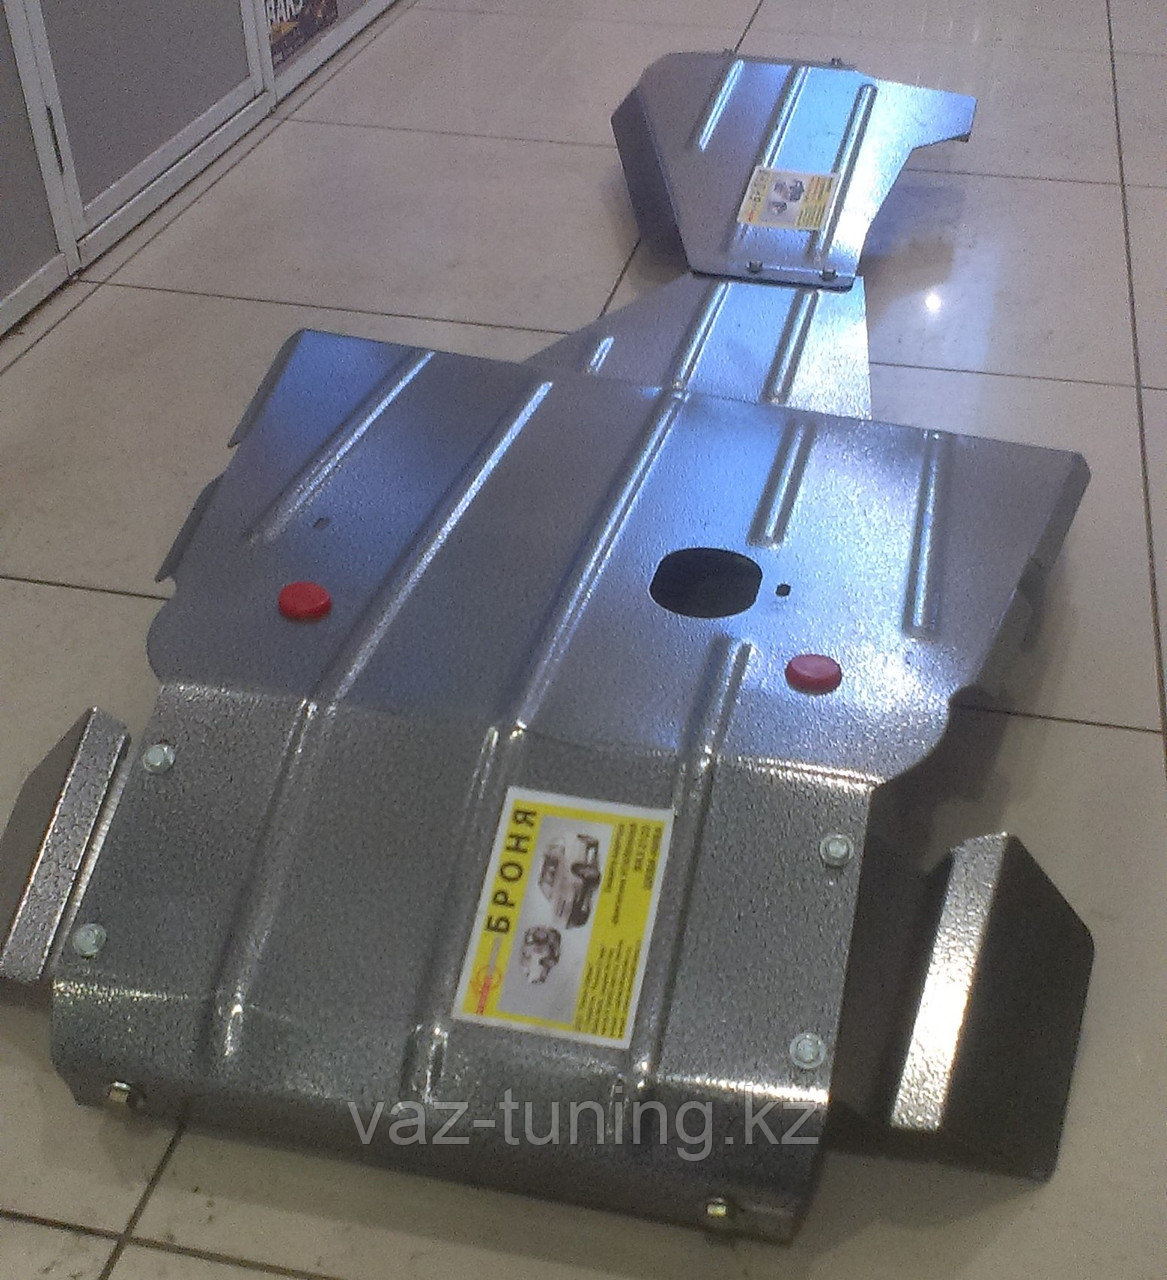 "Защита картера, коробки передач и раздаточной коробки""Броня"" (усиленная) Нива Шевроле 2123"